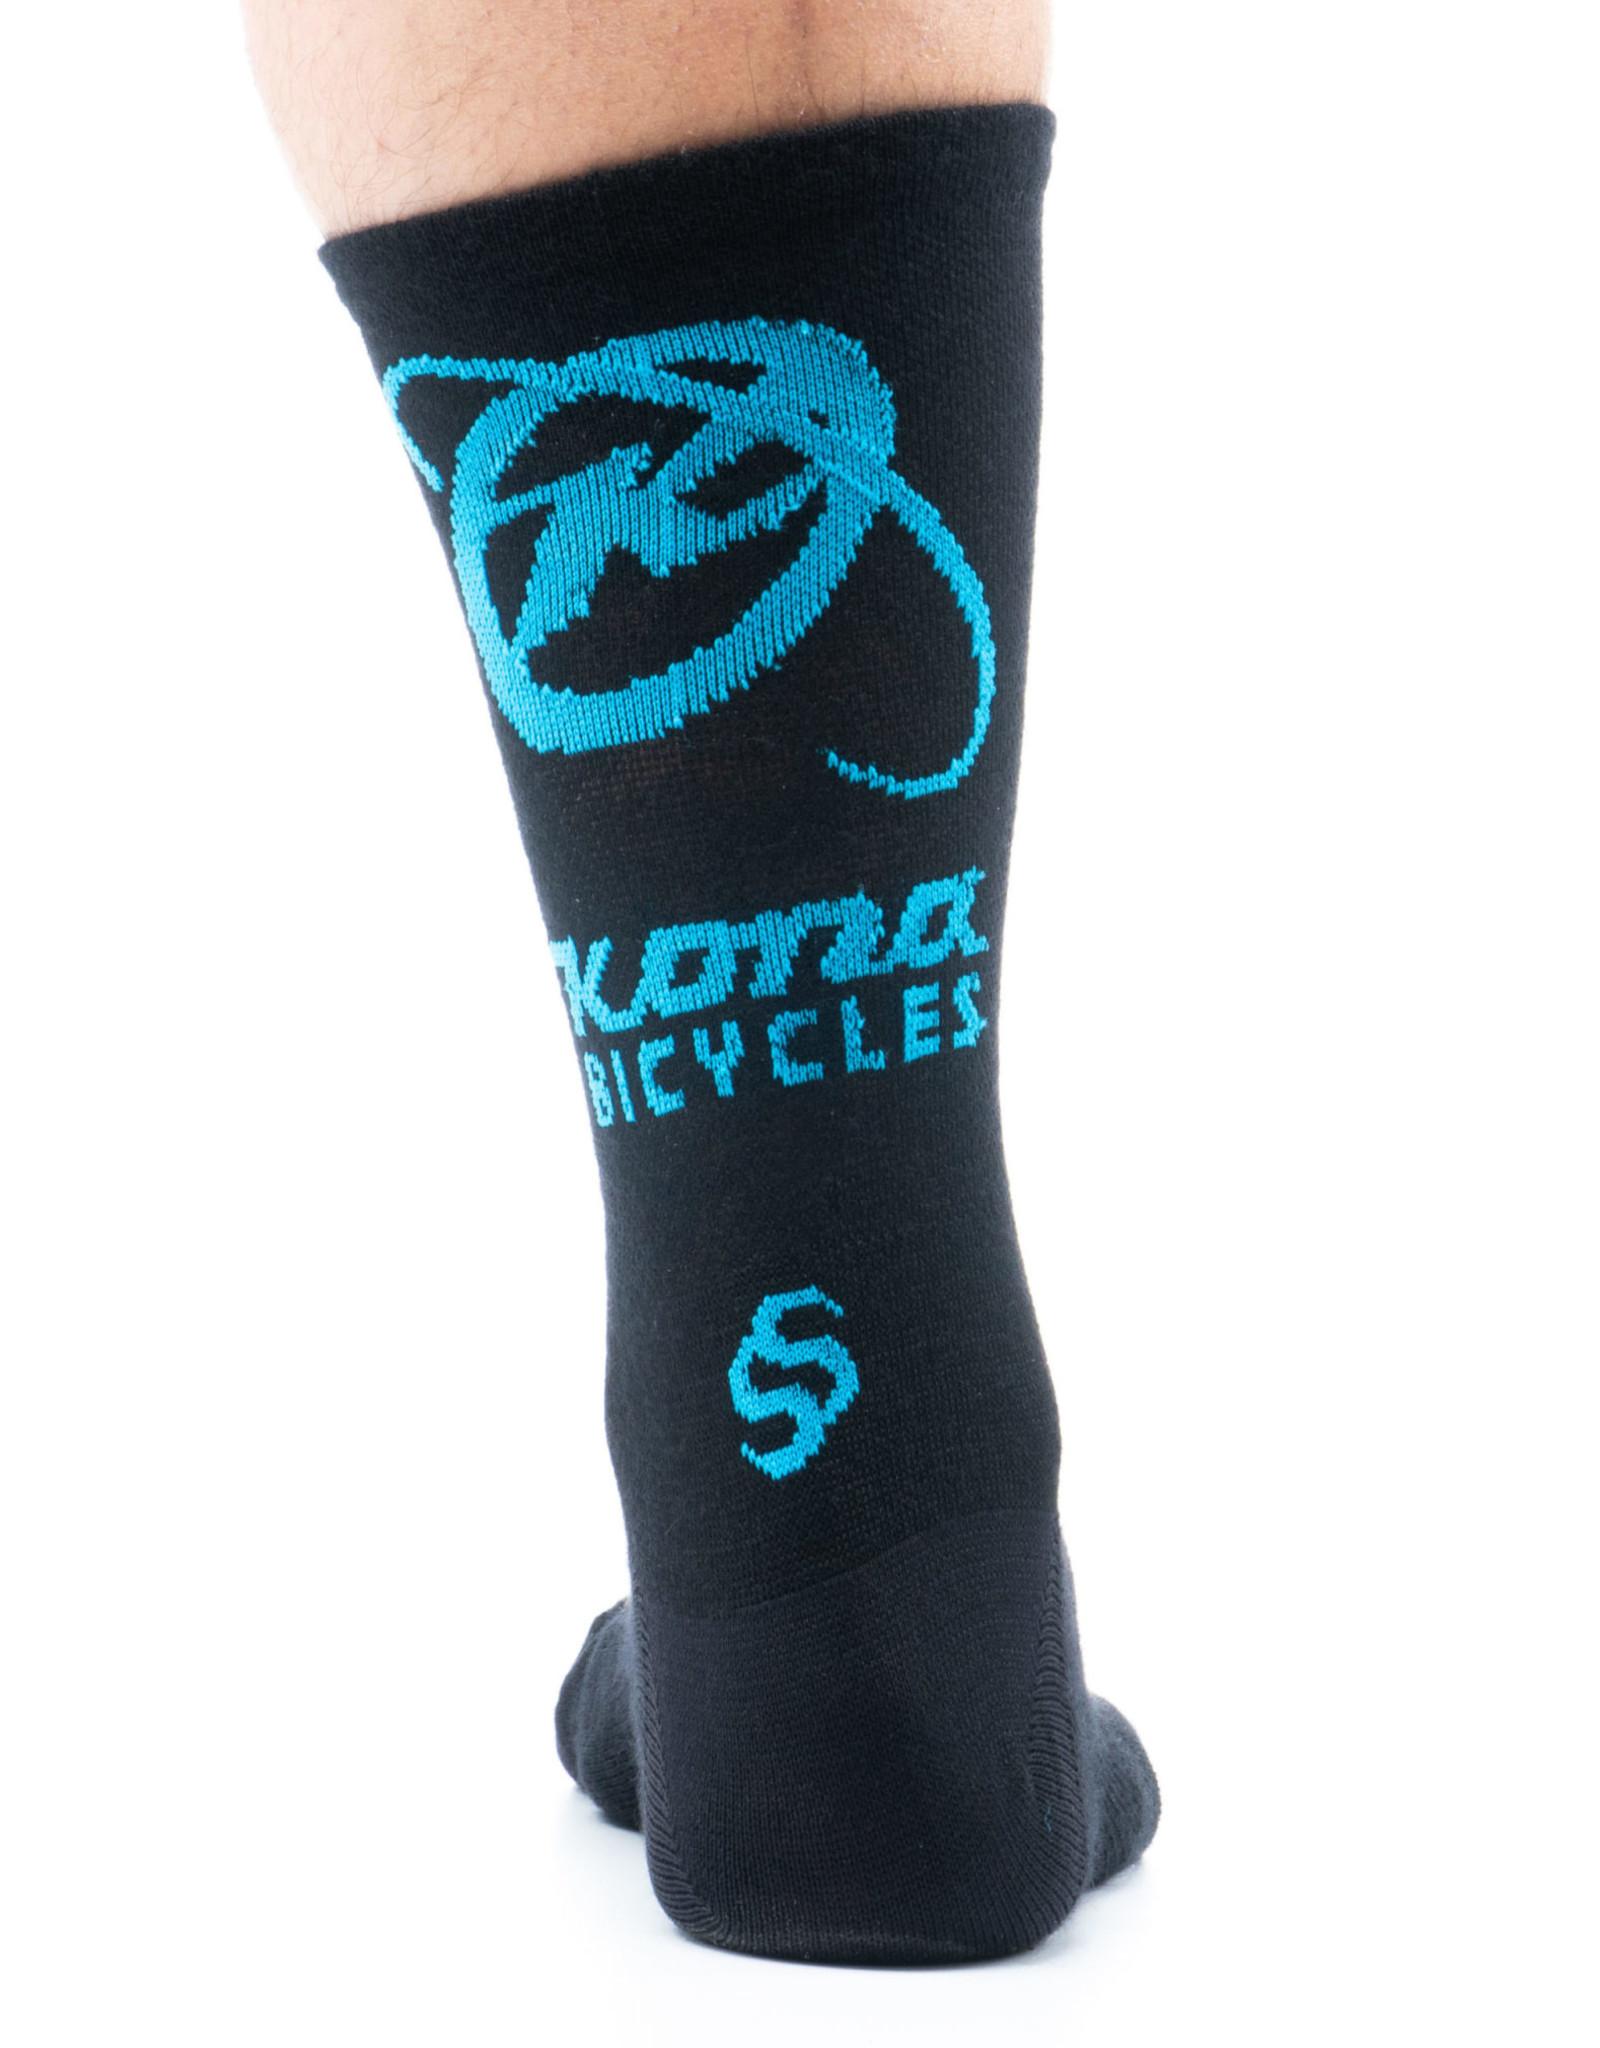 Kona Kona Wool Socks Black and Cyan LG